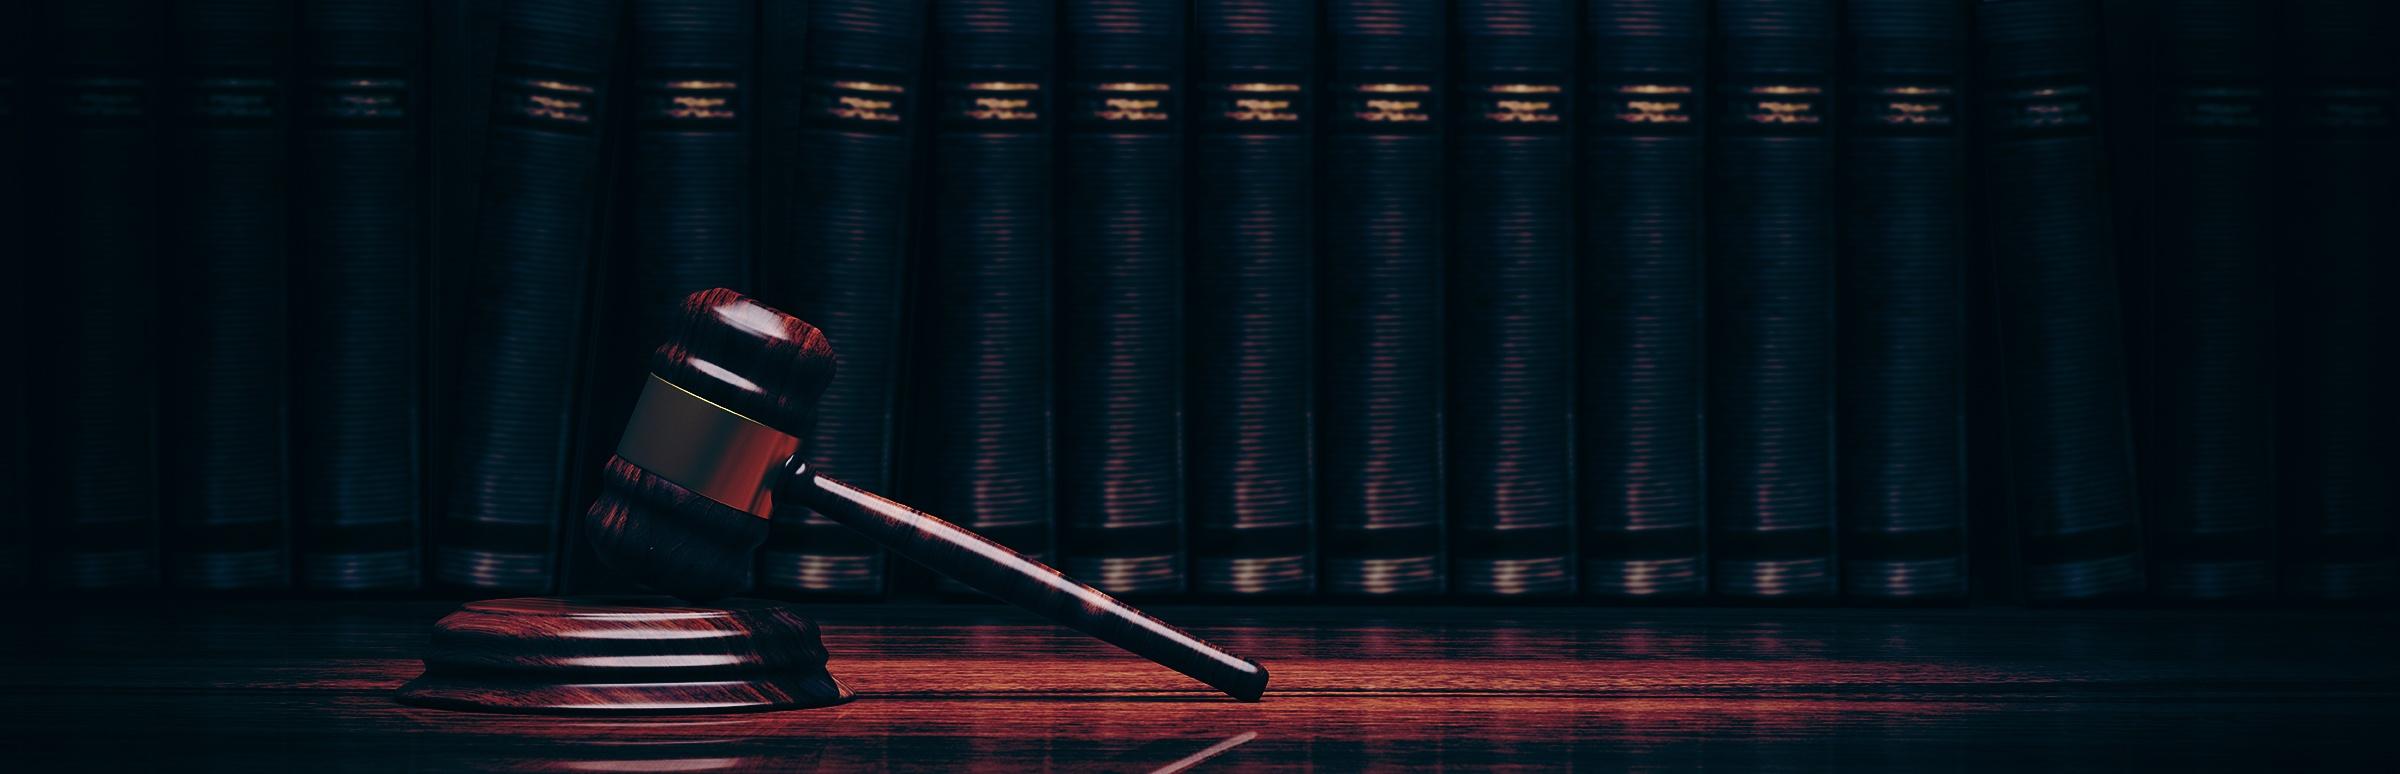 law books01.jpg